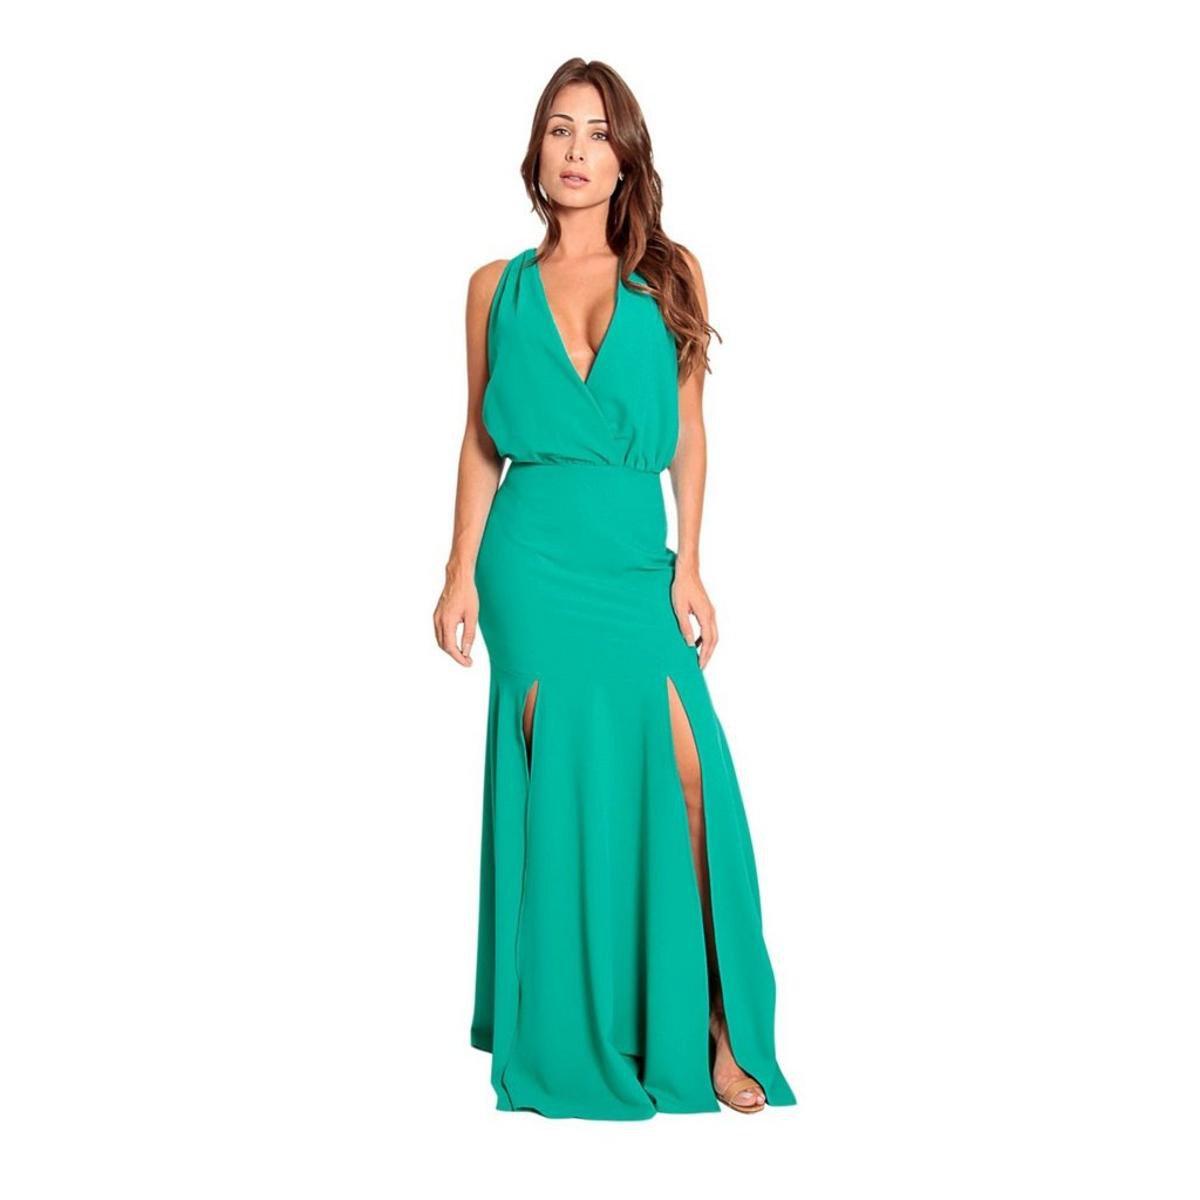 Vestido de festa iza d verde